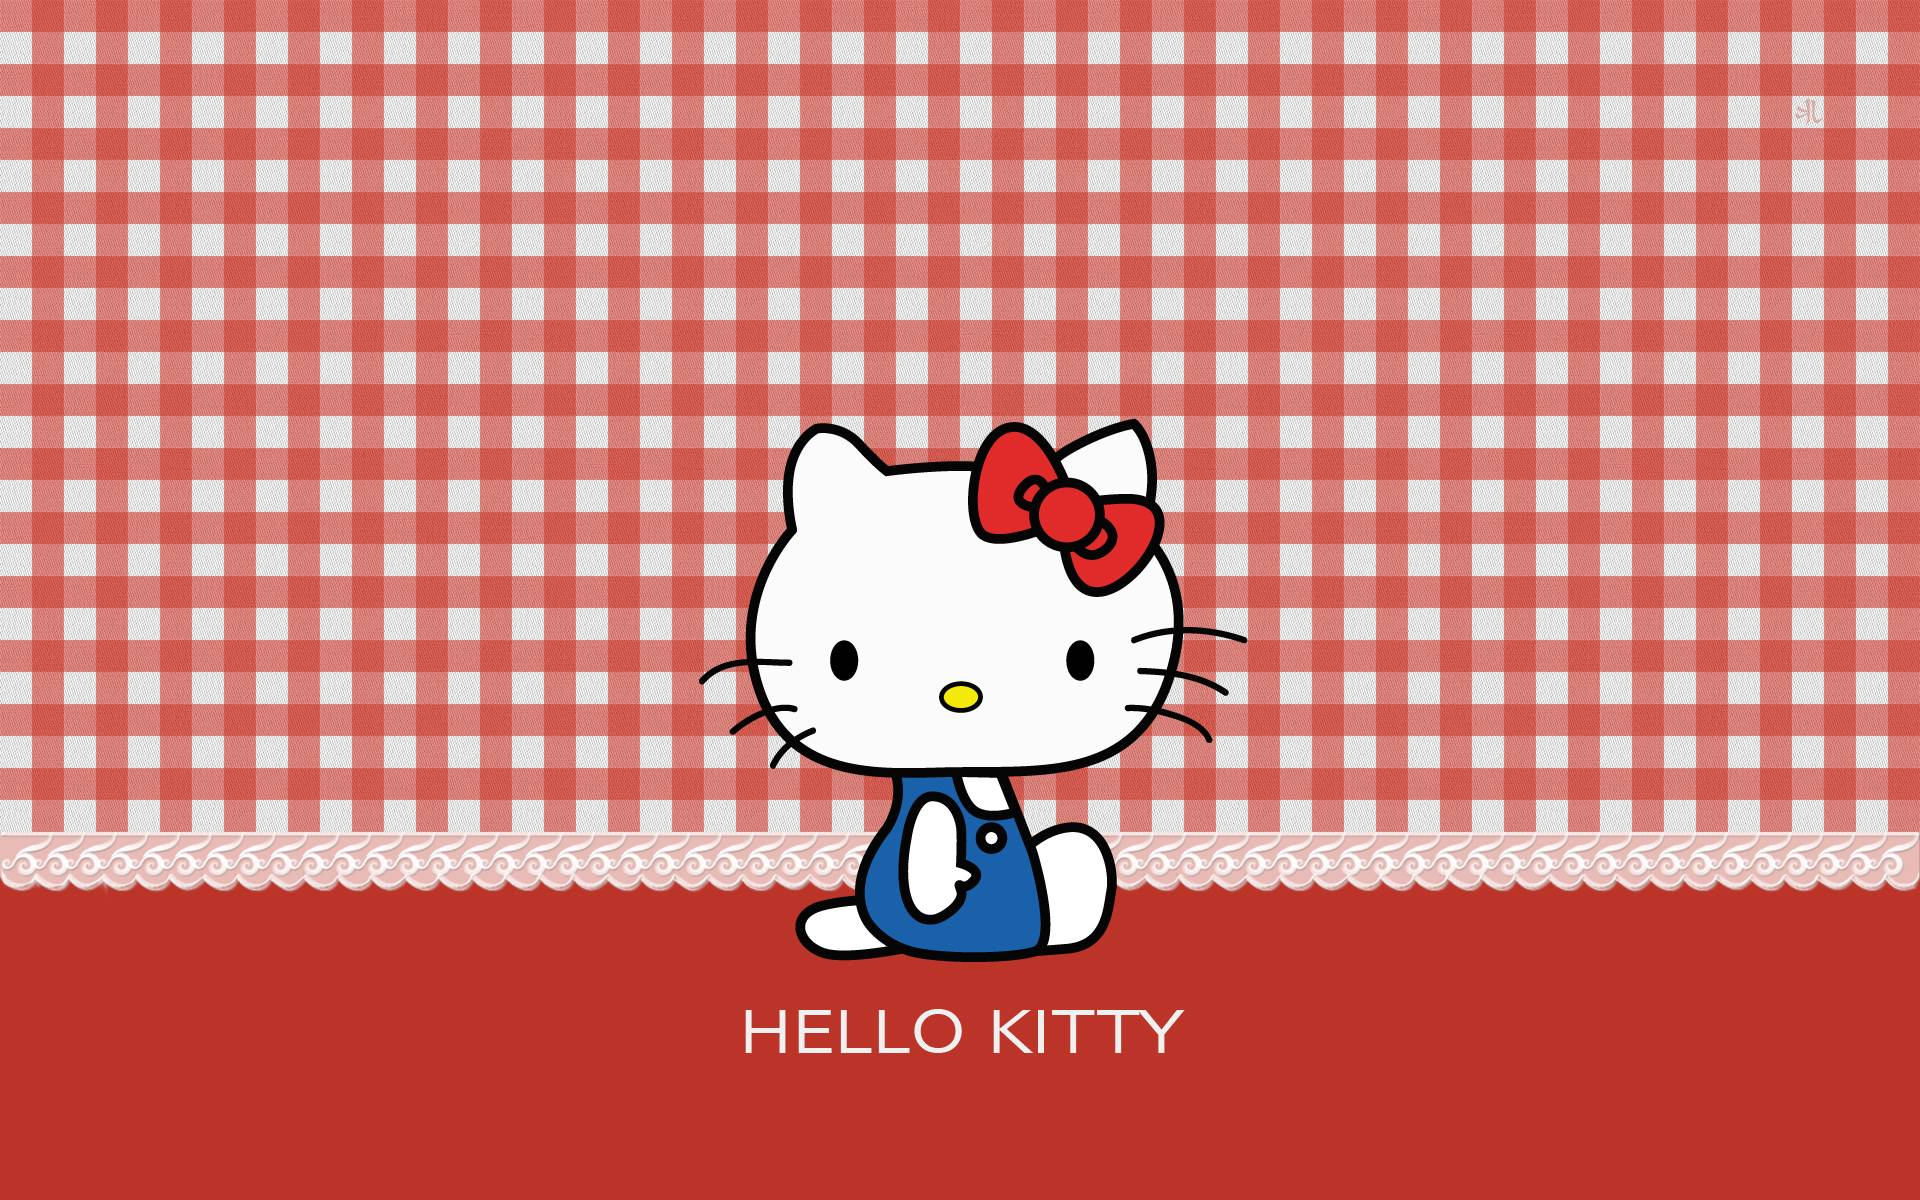 Hello kitty wallpapers hd wallpaper cave - Wallpaper hello kitty full hd ...